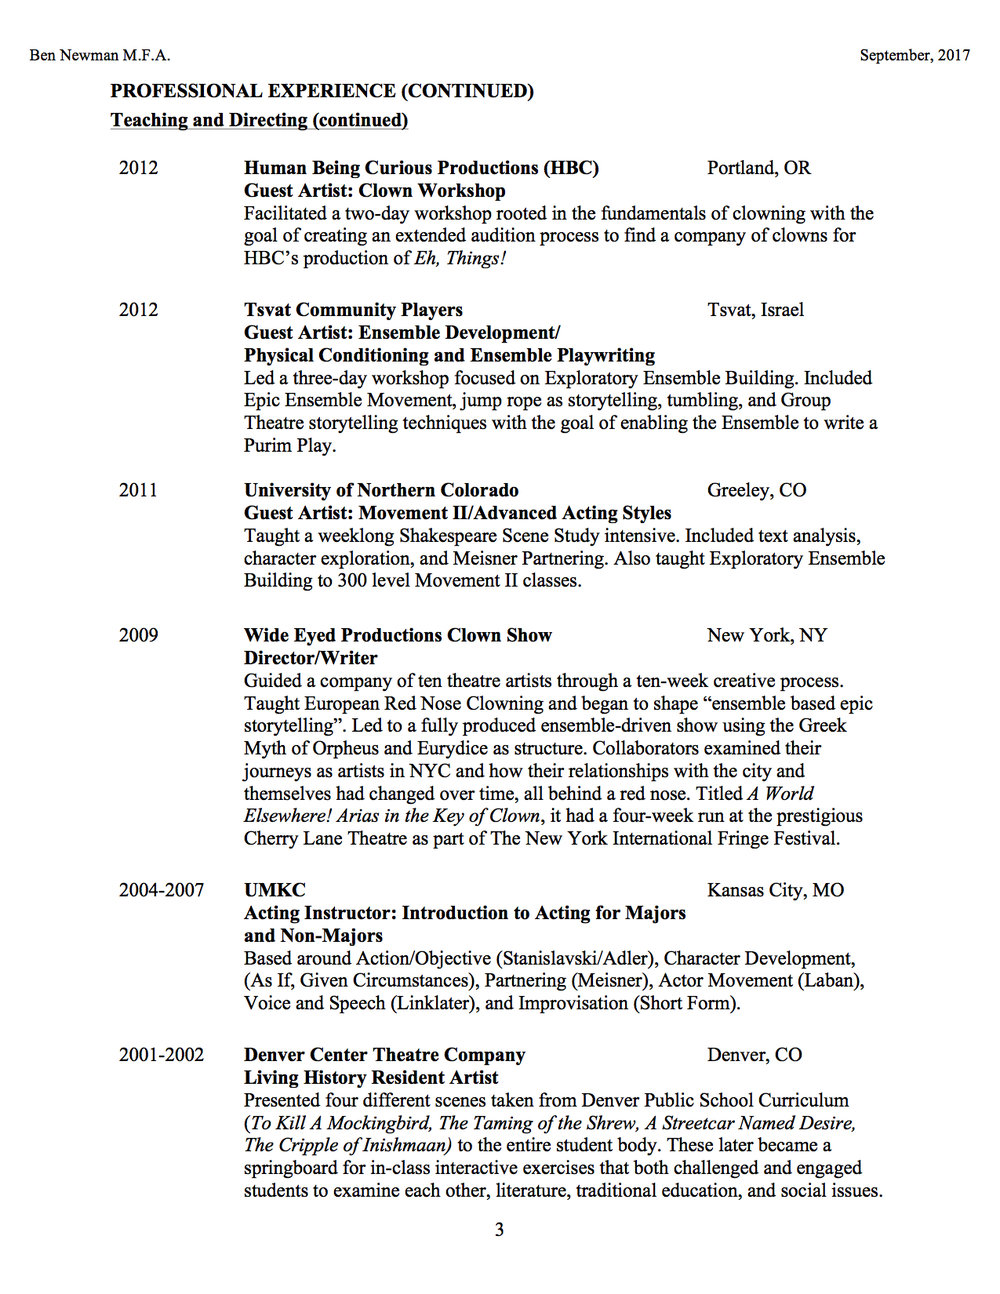 Curriculum Vitae3.jpg